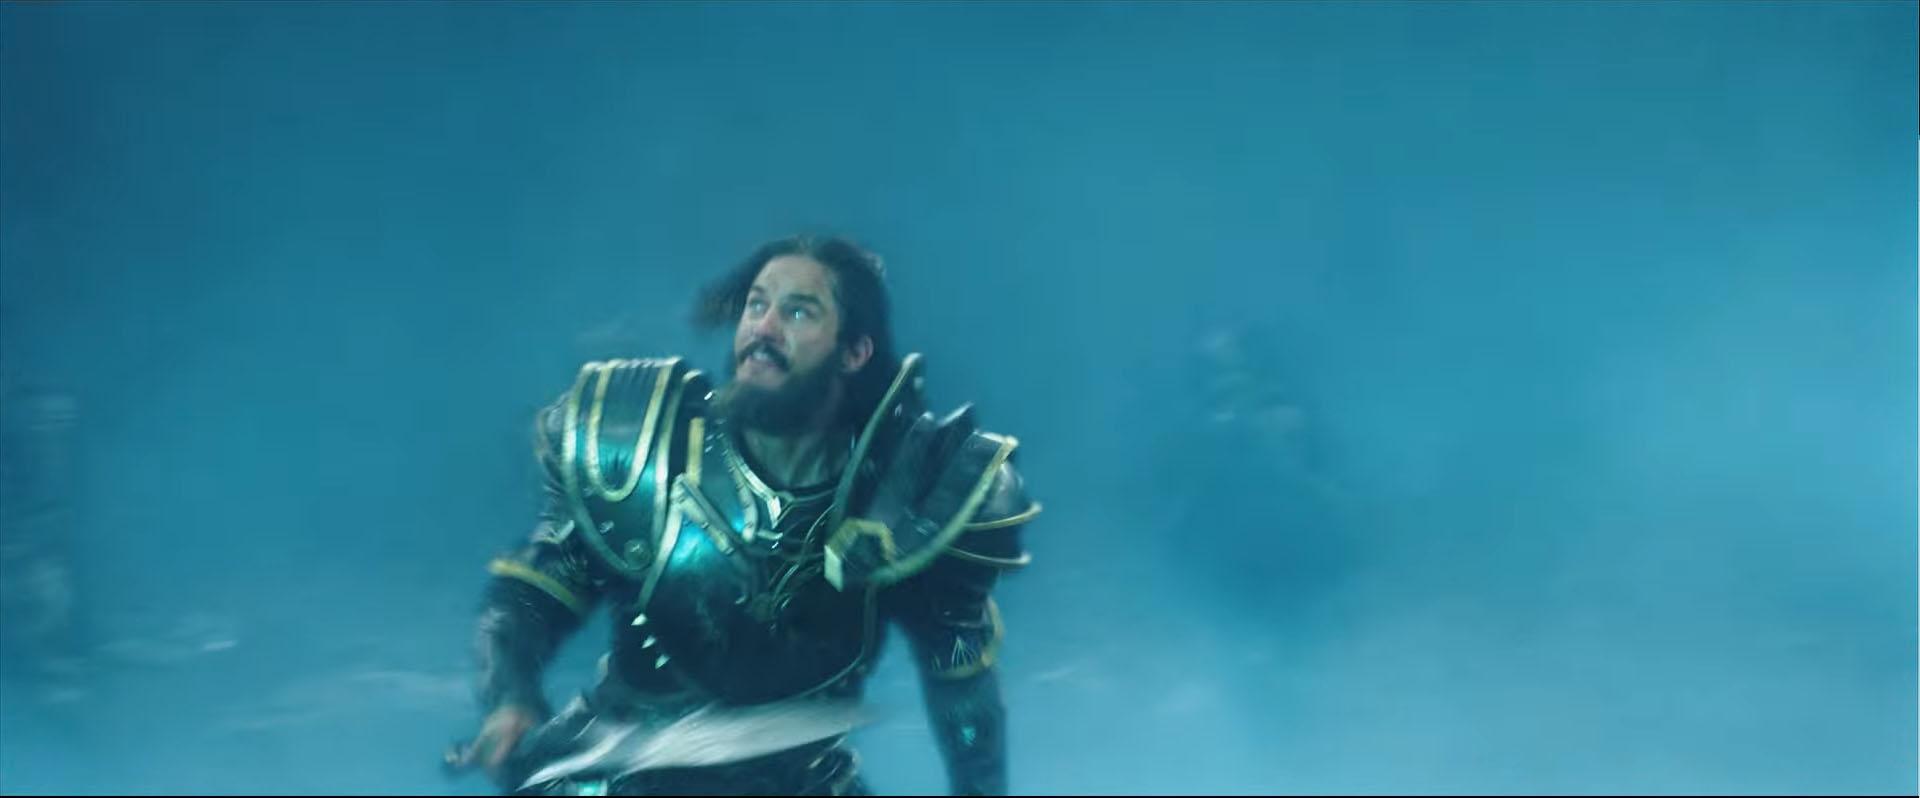 Warcraft Fragmanı 52